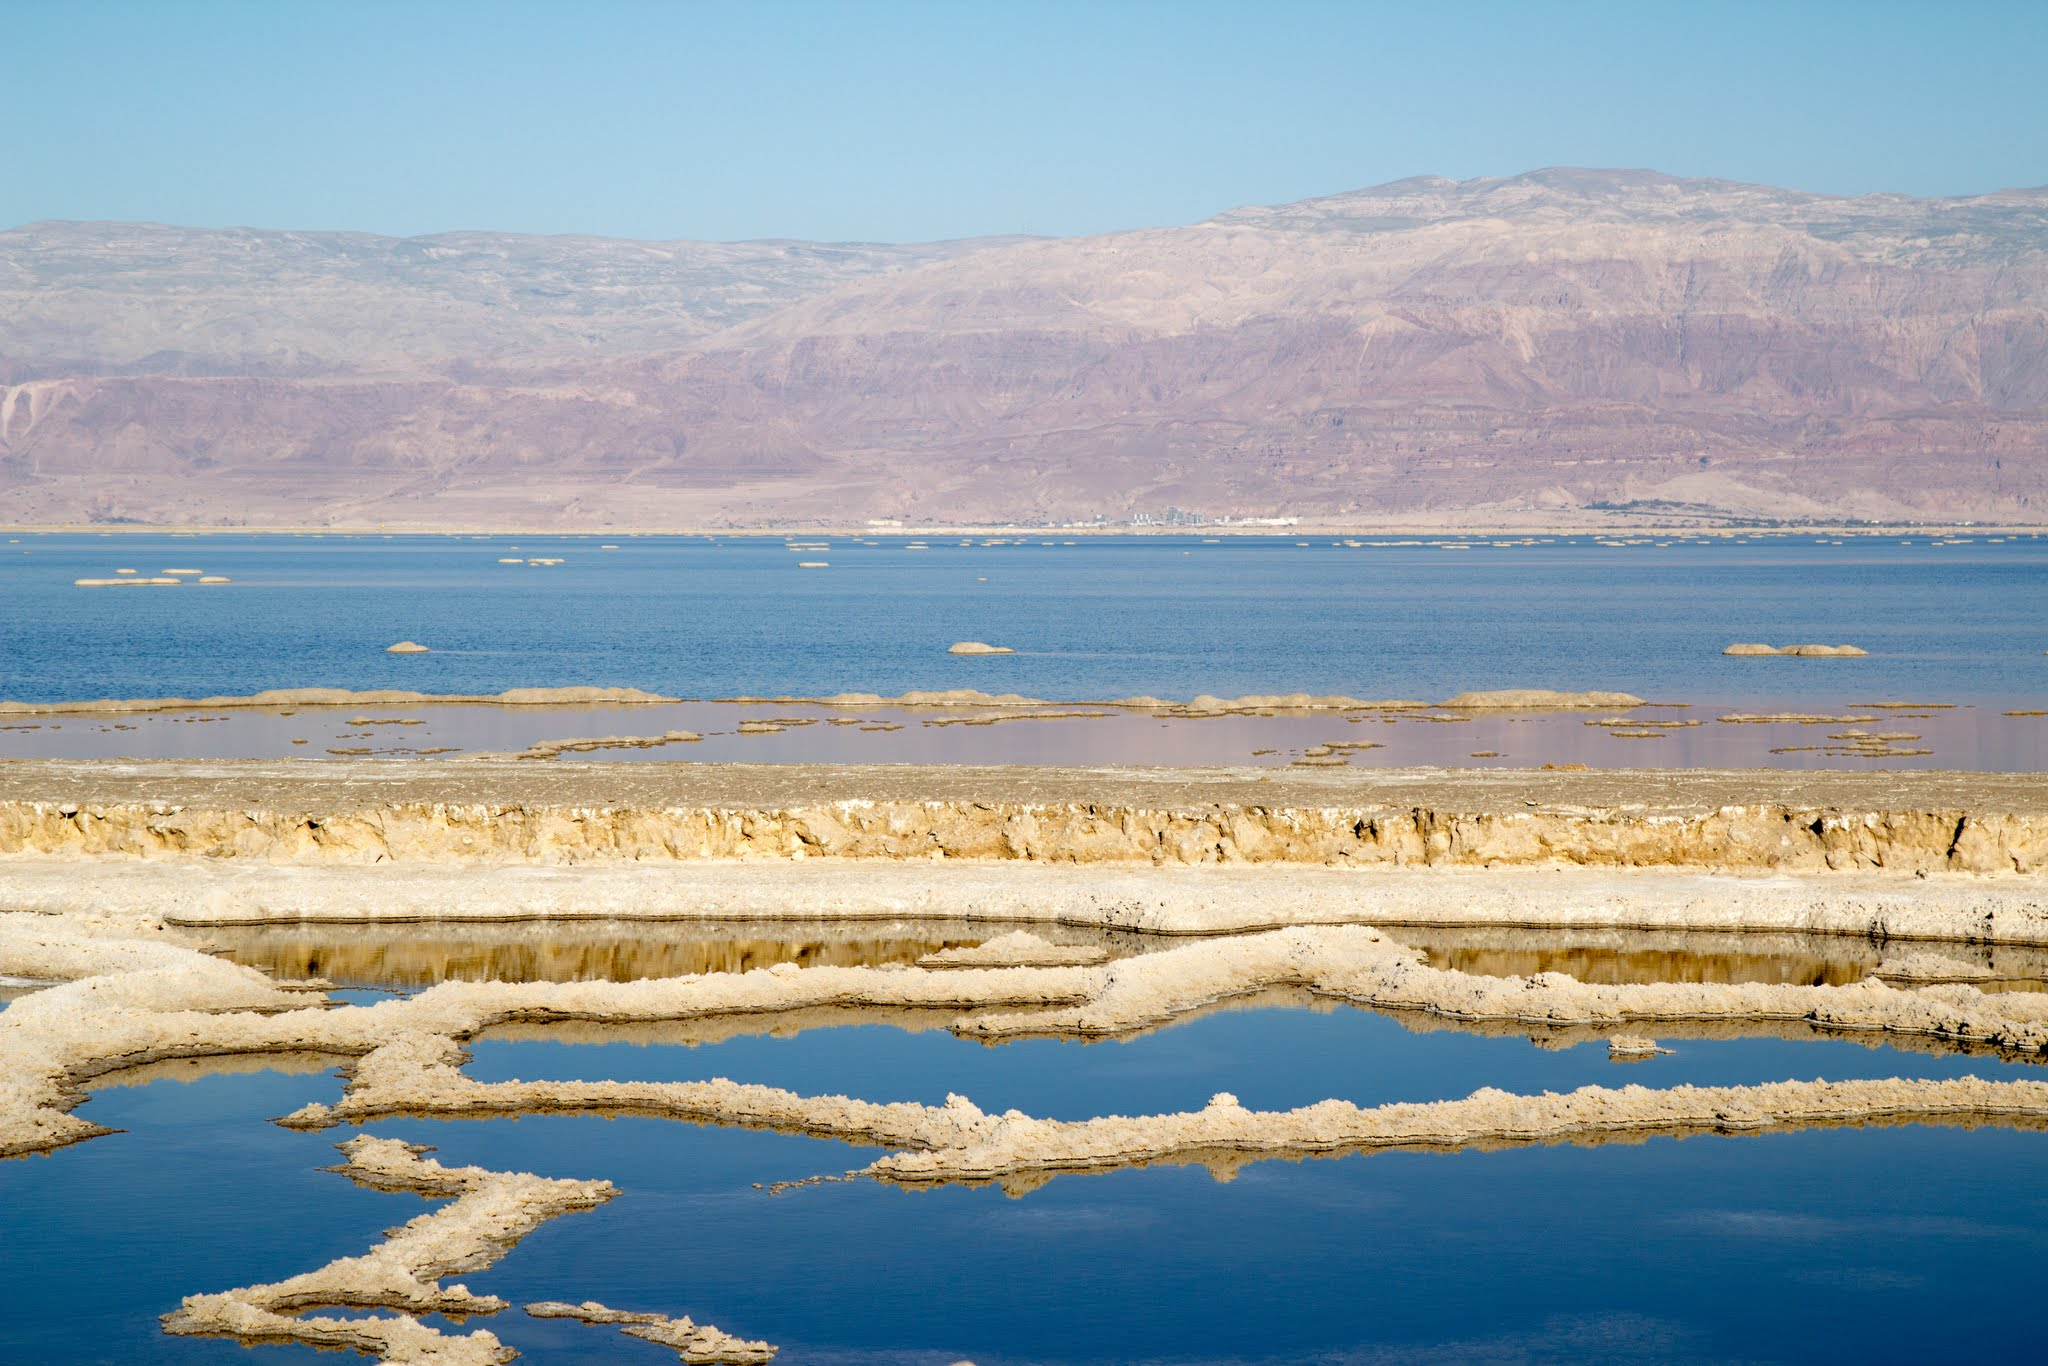 Morze Martwe, Izrael